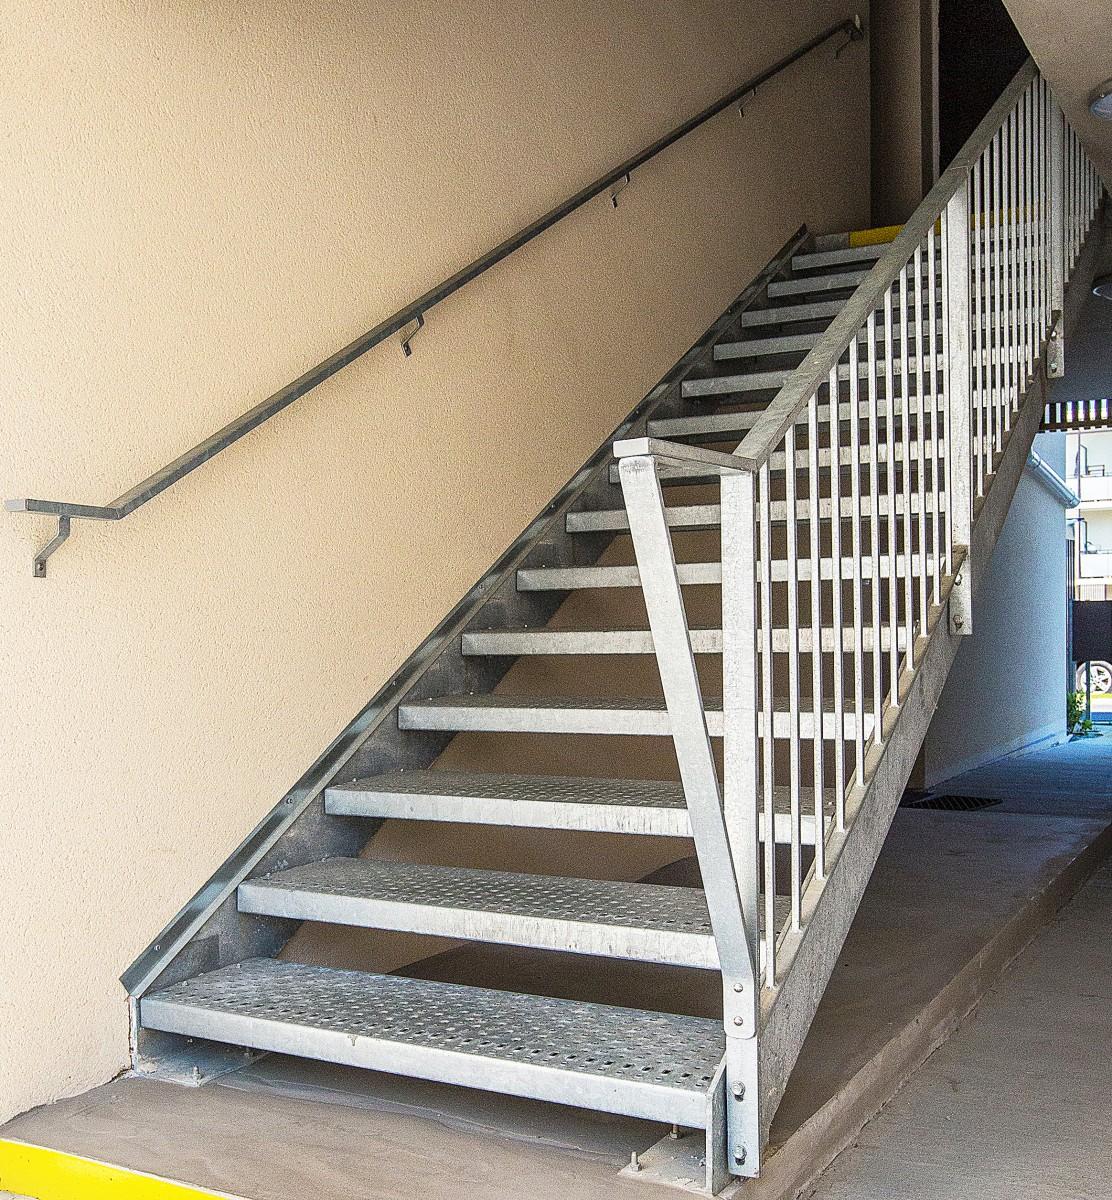 escalier exterieur aluminium main courante escalier exterieur aluminium of kit main courante. Black Bedroom Furniture Sets. Home Design Ideas